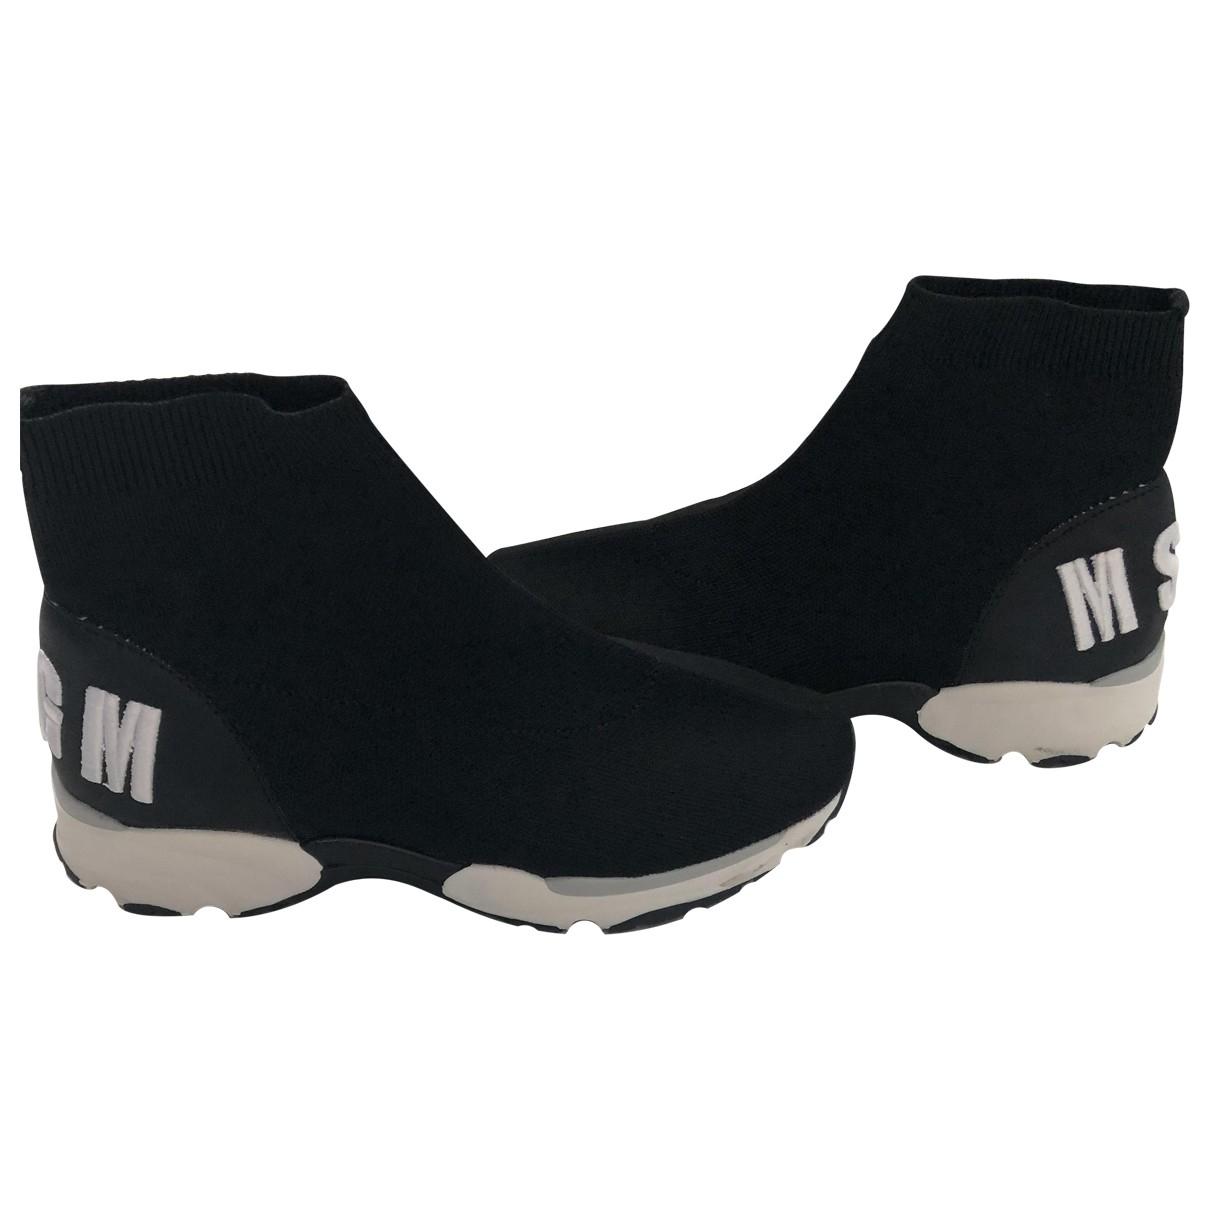 Msgm \N Black Cloth Trainers for Women 37 EU